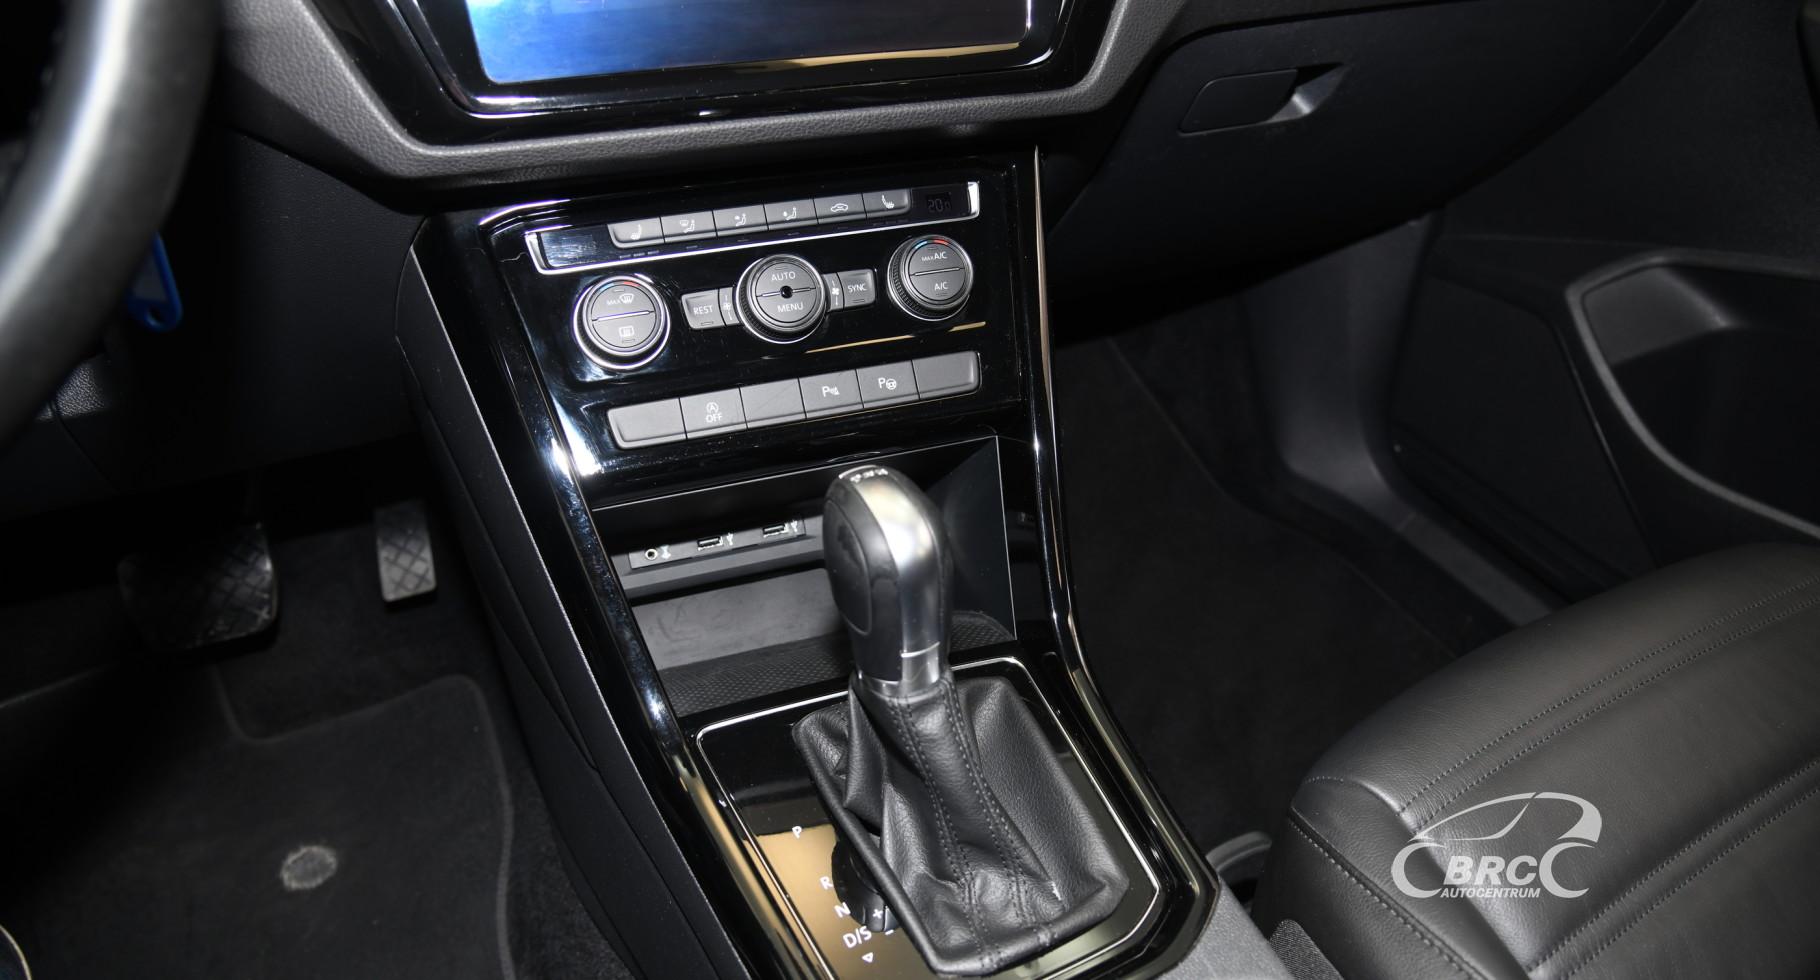 Volkswagen Touran 2.0 TDI R-Line DSG Automatas